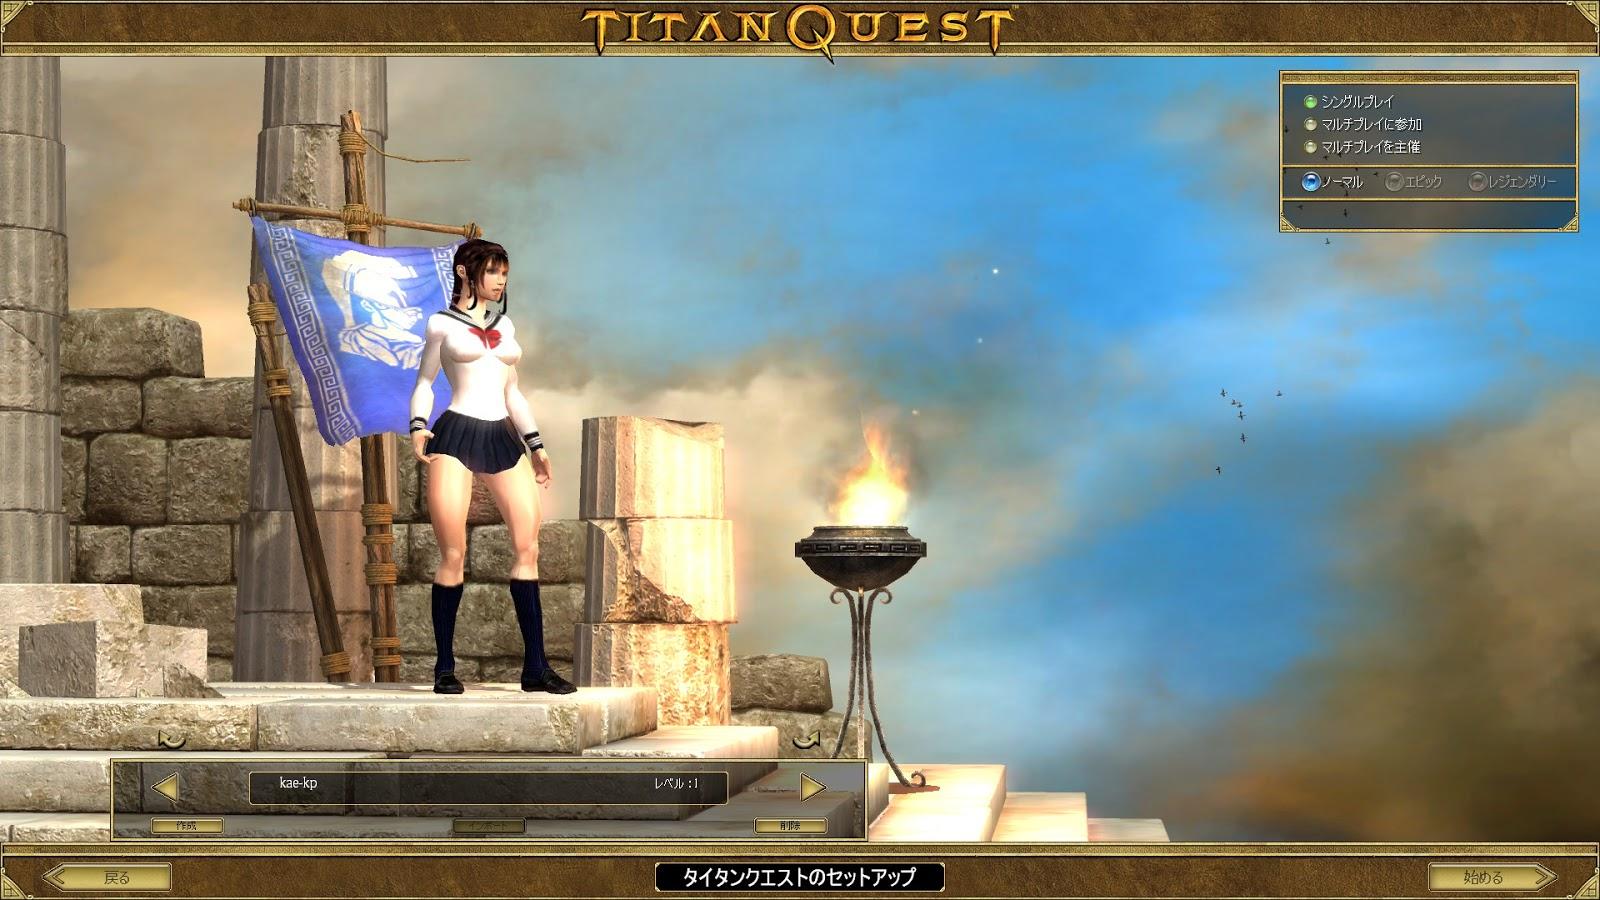 Windows 8 titan quest mods